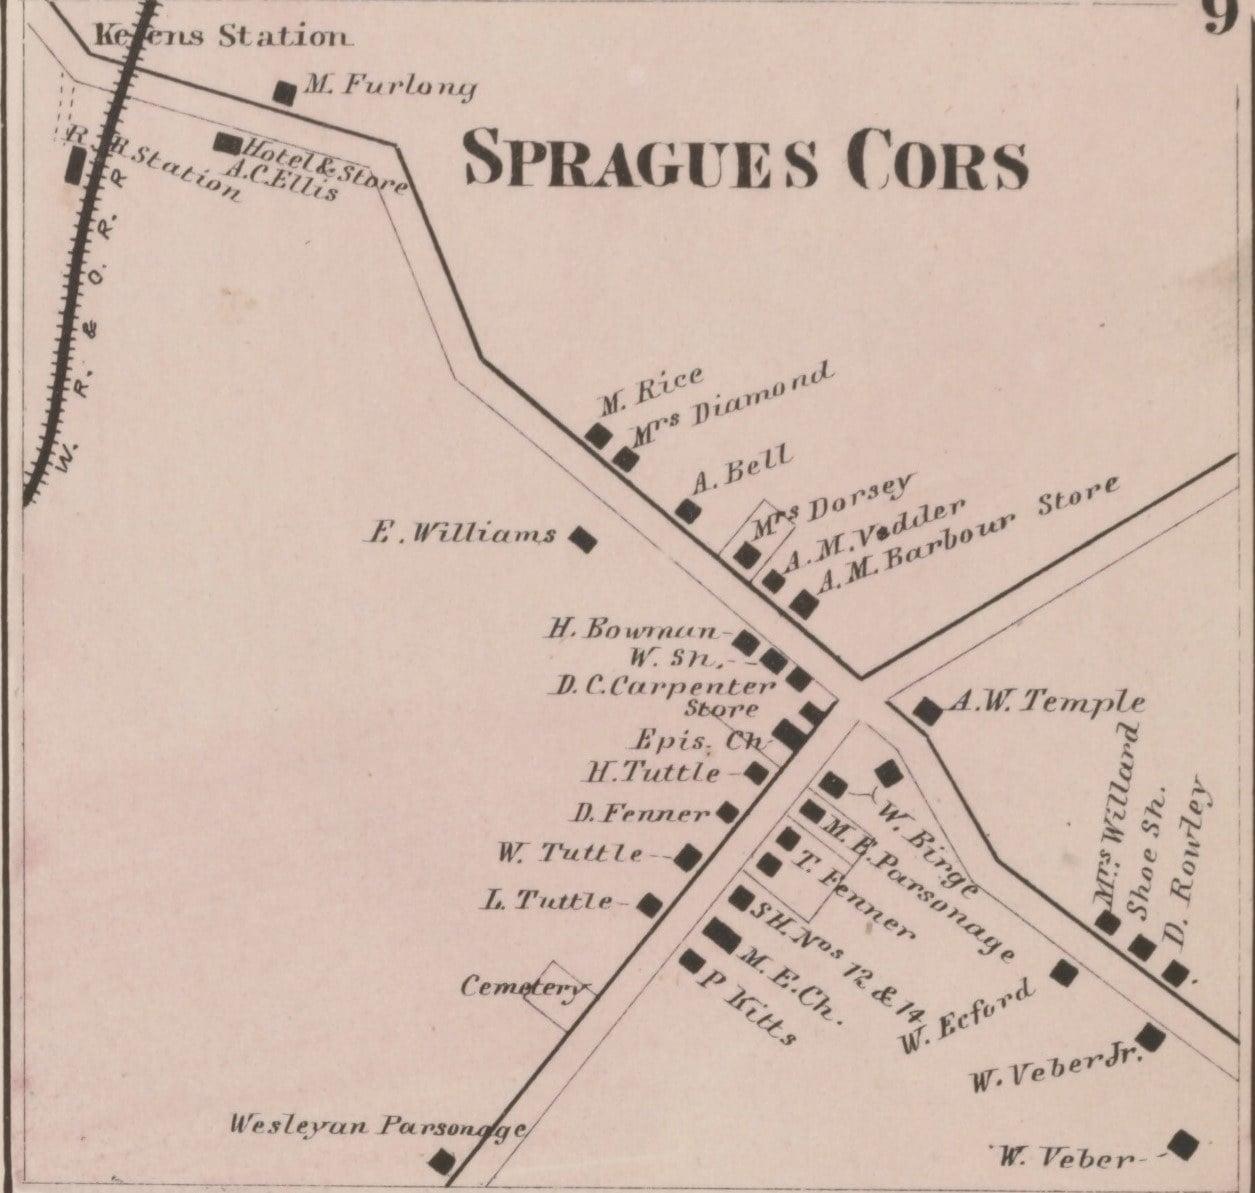 1864 Map of Spragues Corners